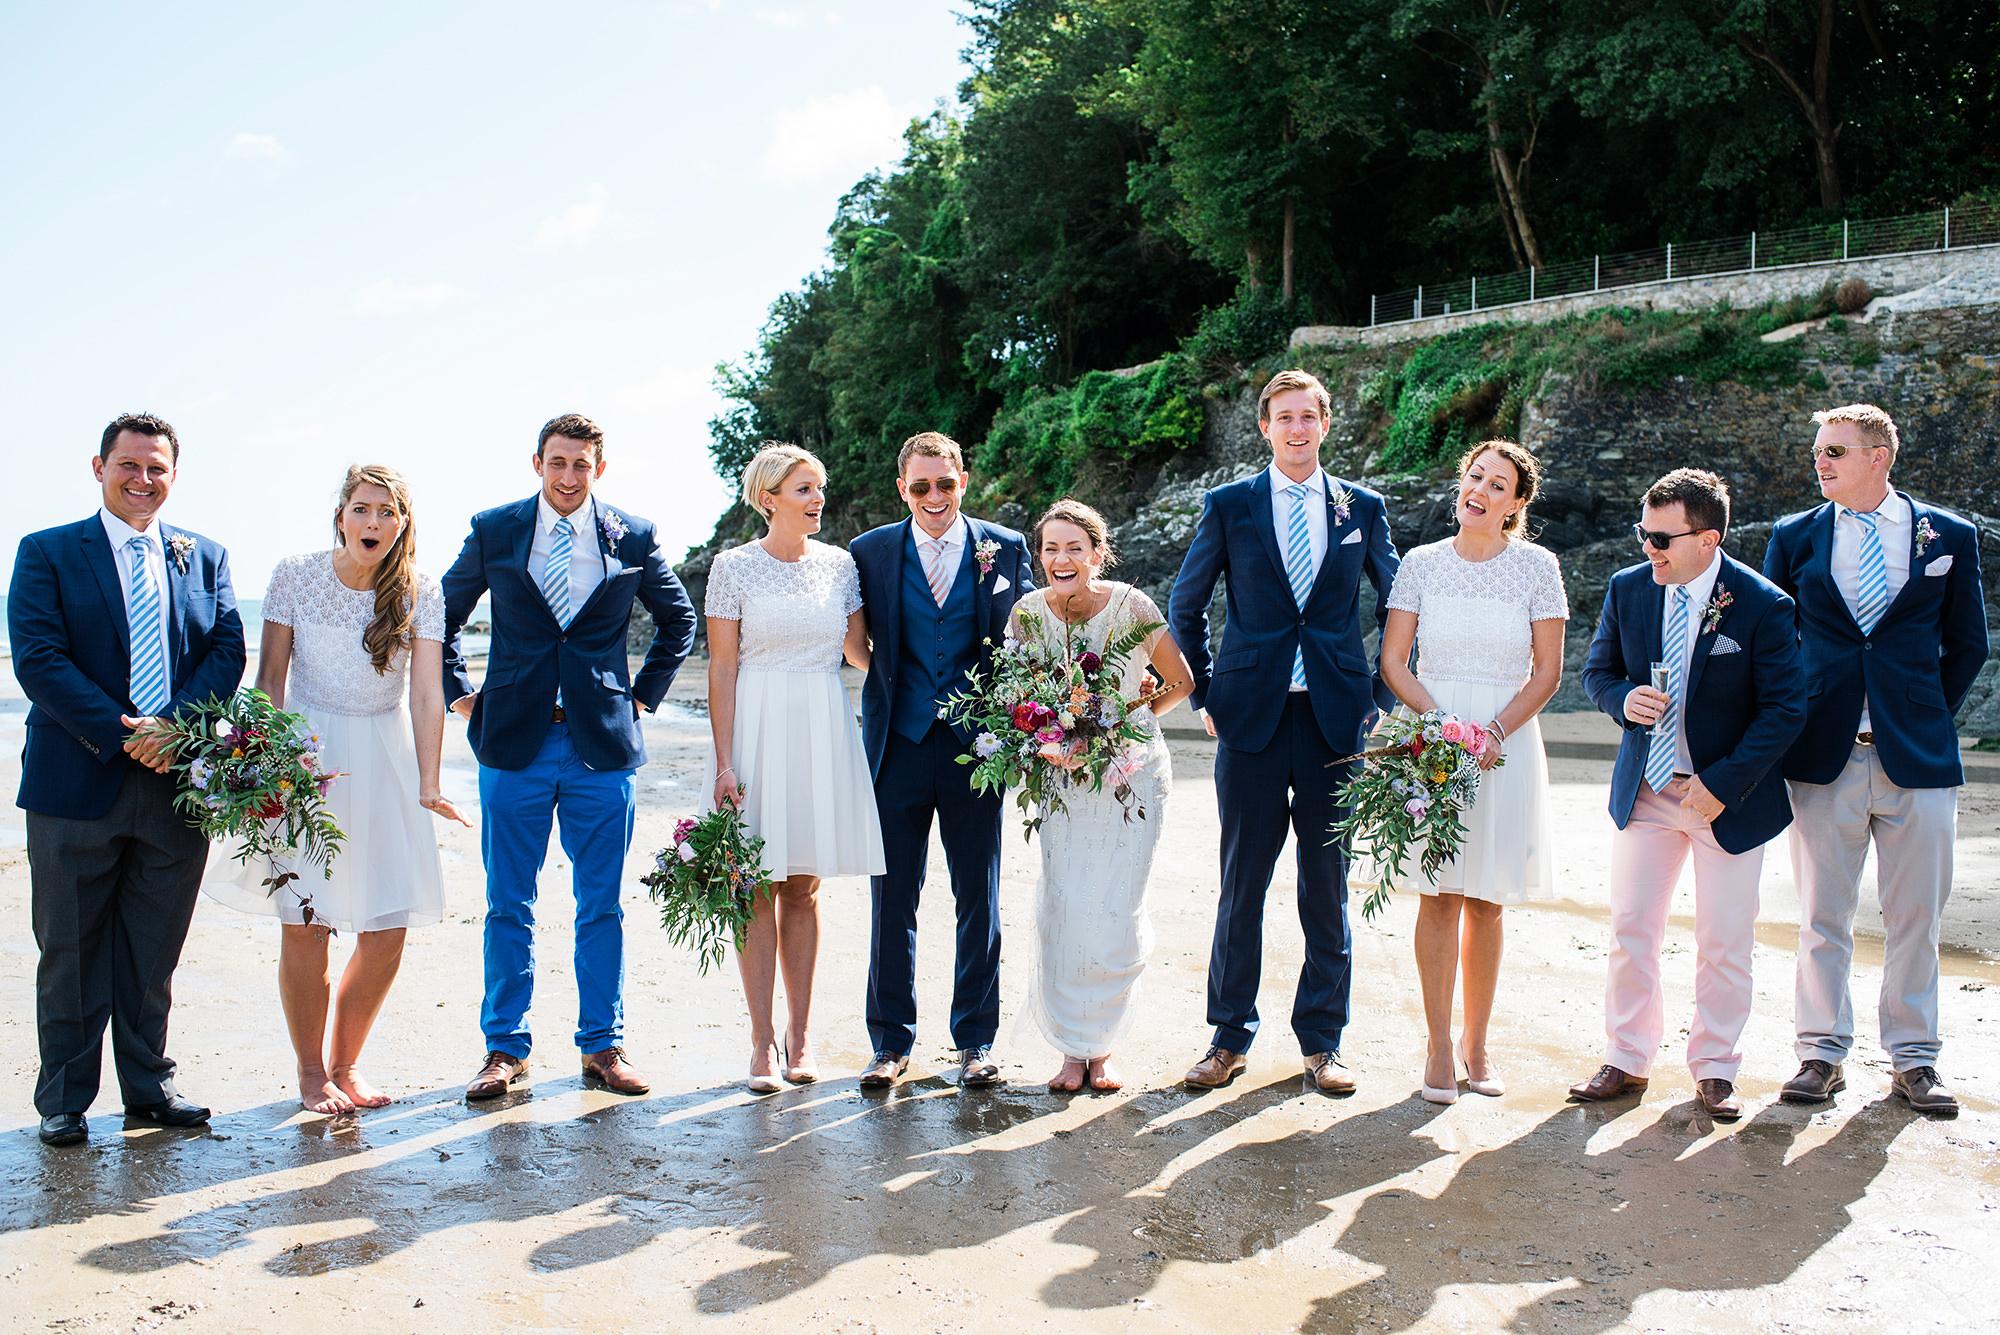 Simon biffen-best of 2015 wedding photographs-04